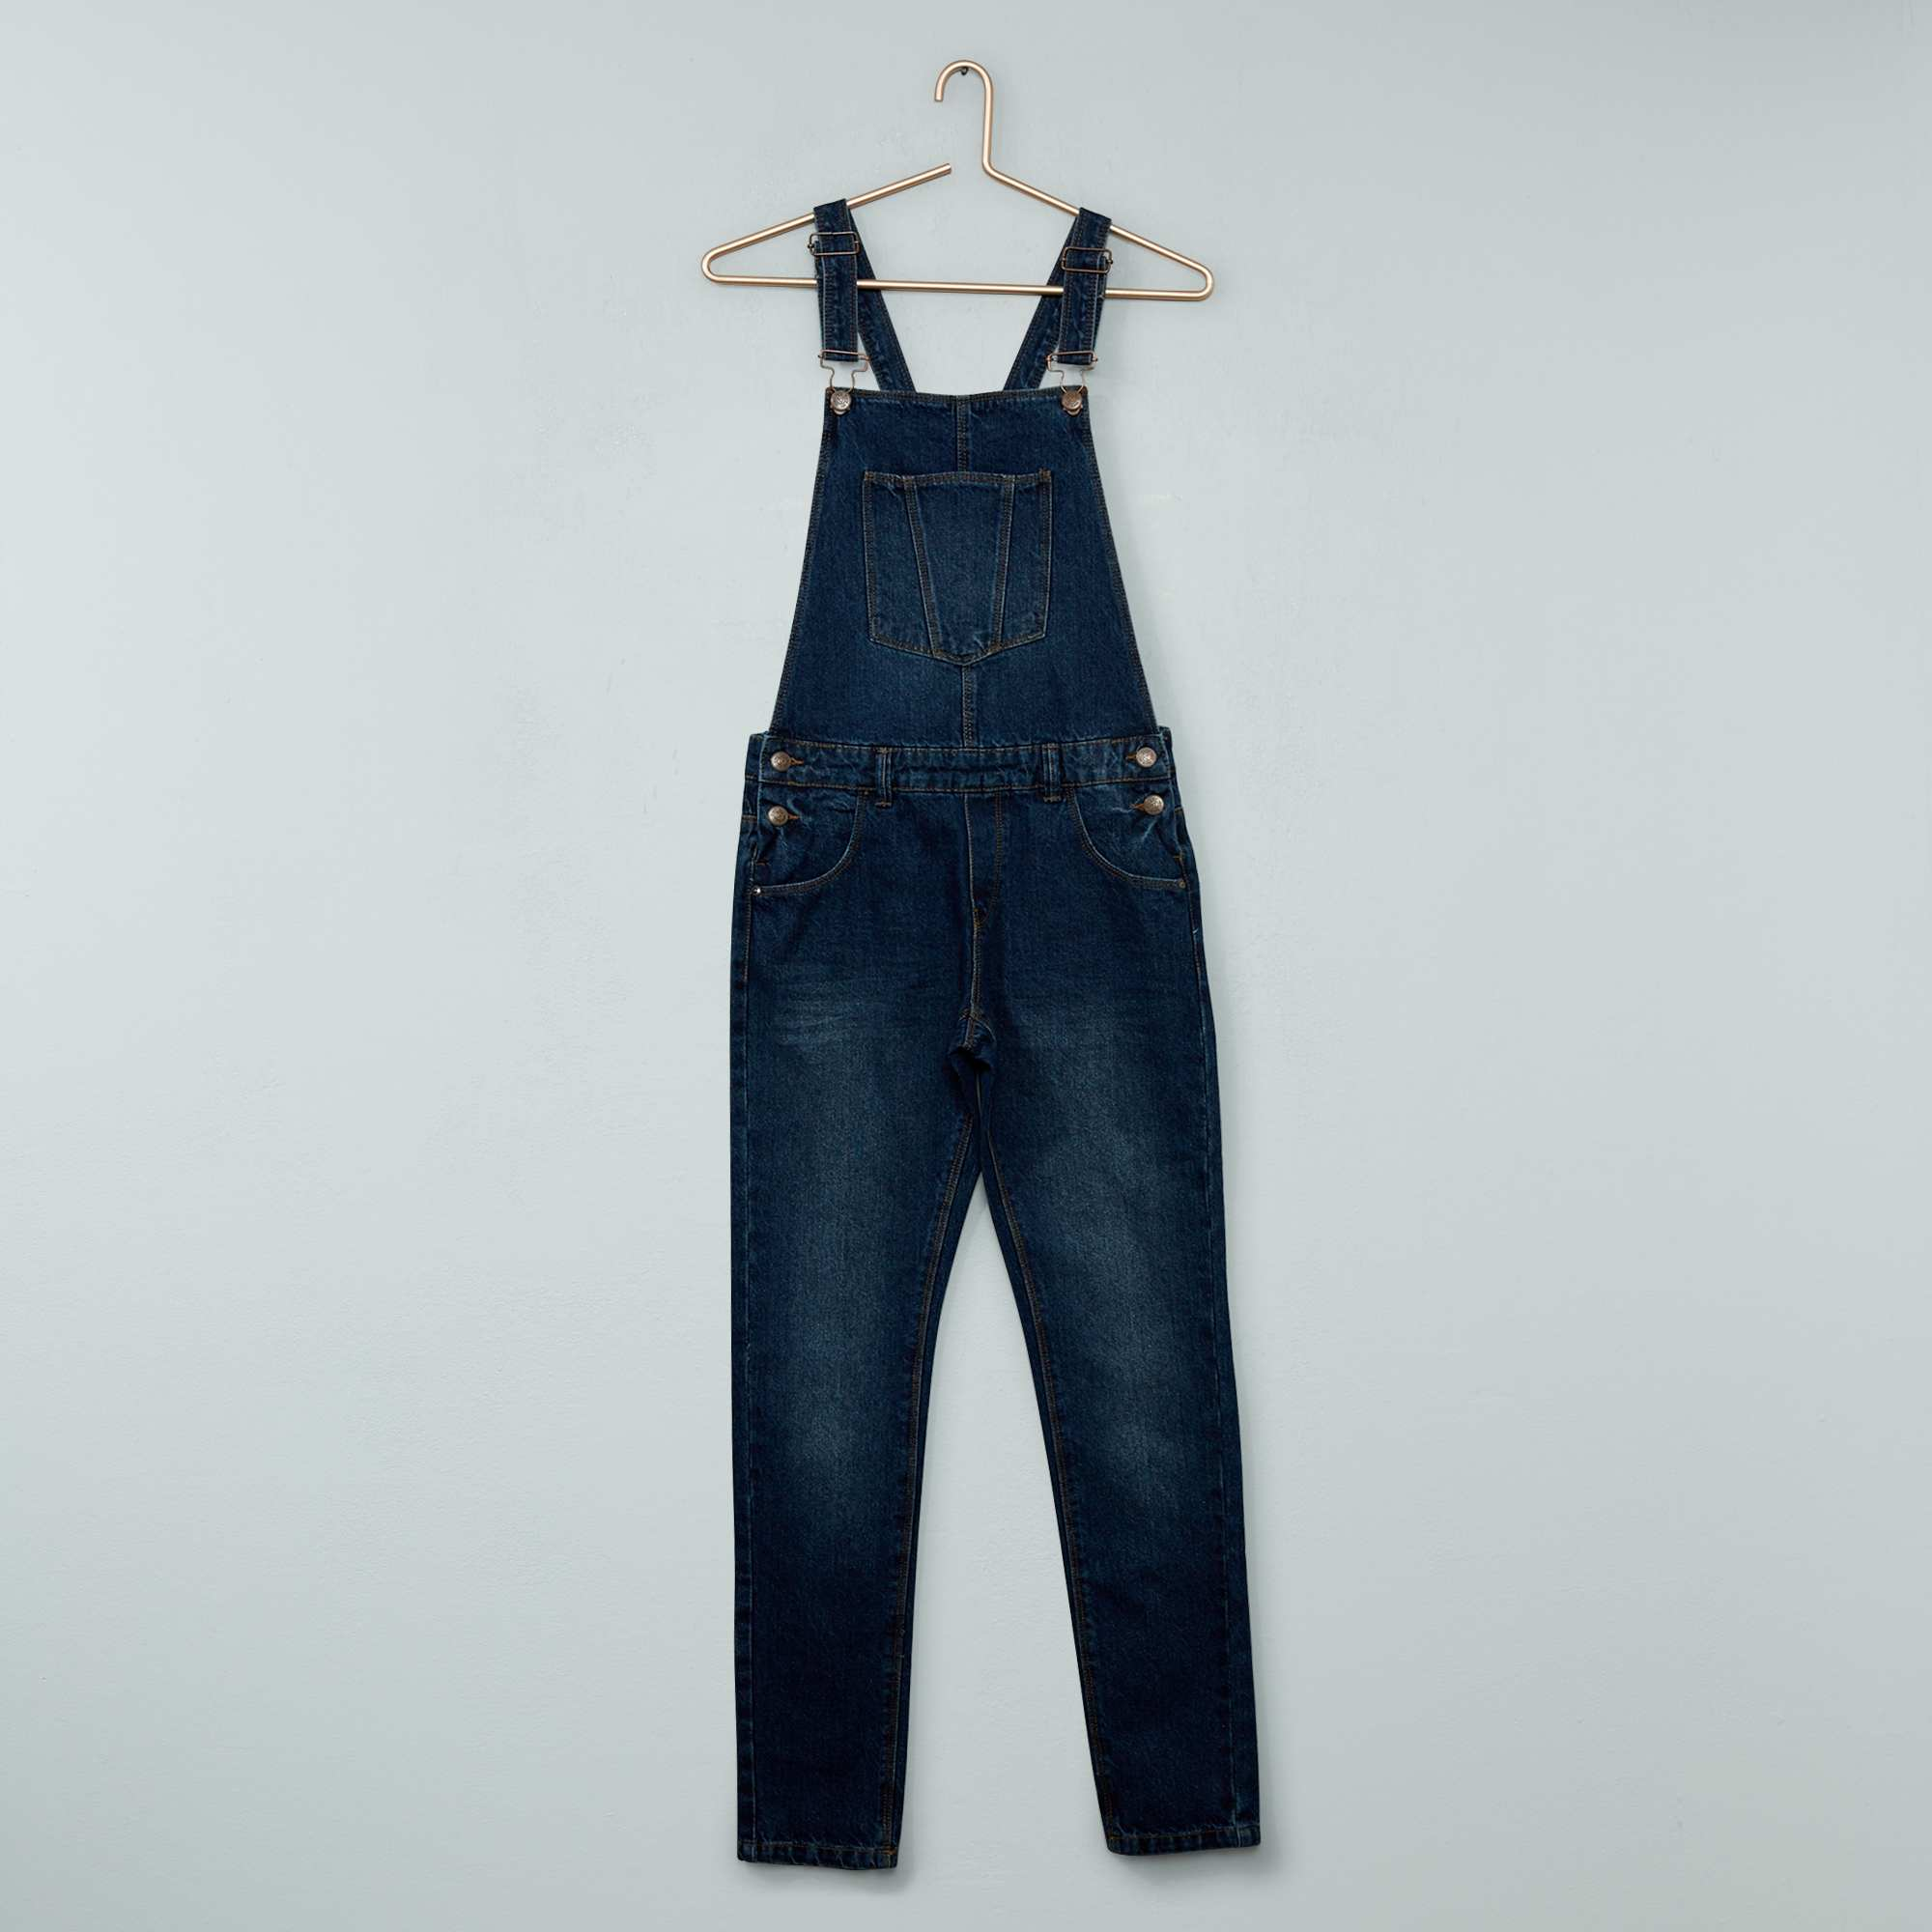 Jardineira jeans Kiabi